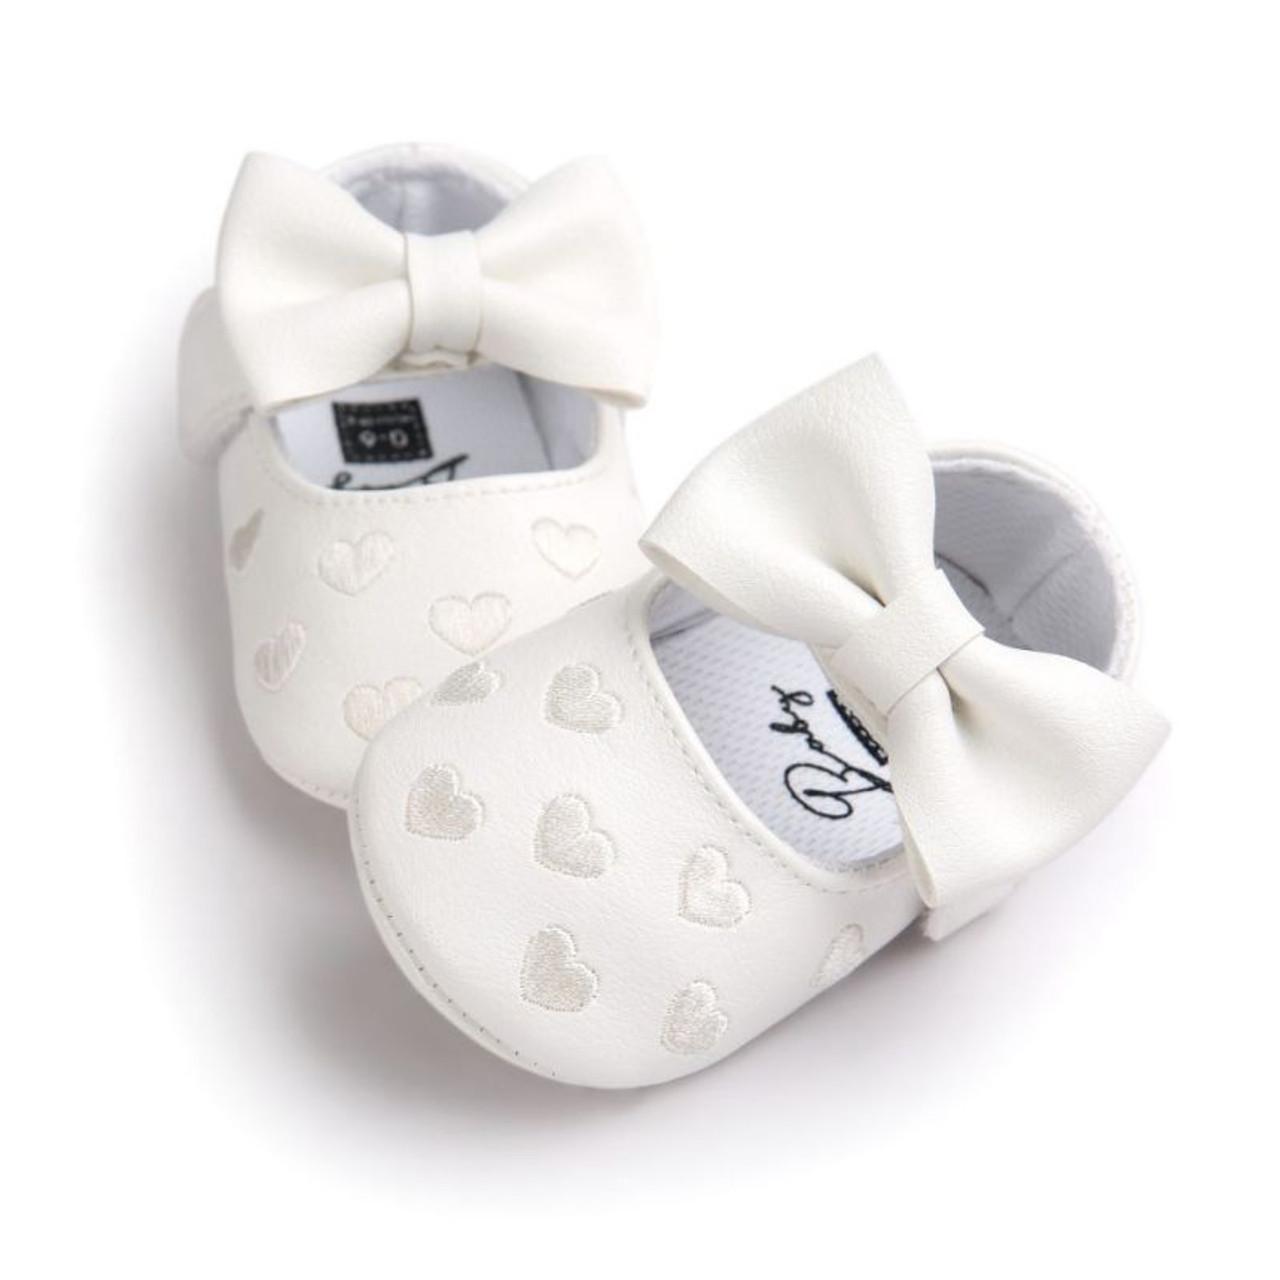 9140dd38054 ... Bebe PU Leather Baby Boy Girl Baby Moccasins Moccs Shoes Bow Fringe  Soft Soled Non- ...